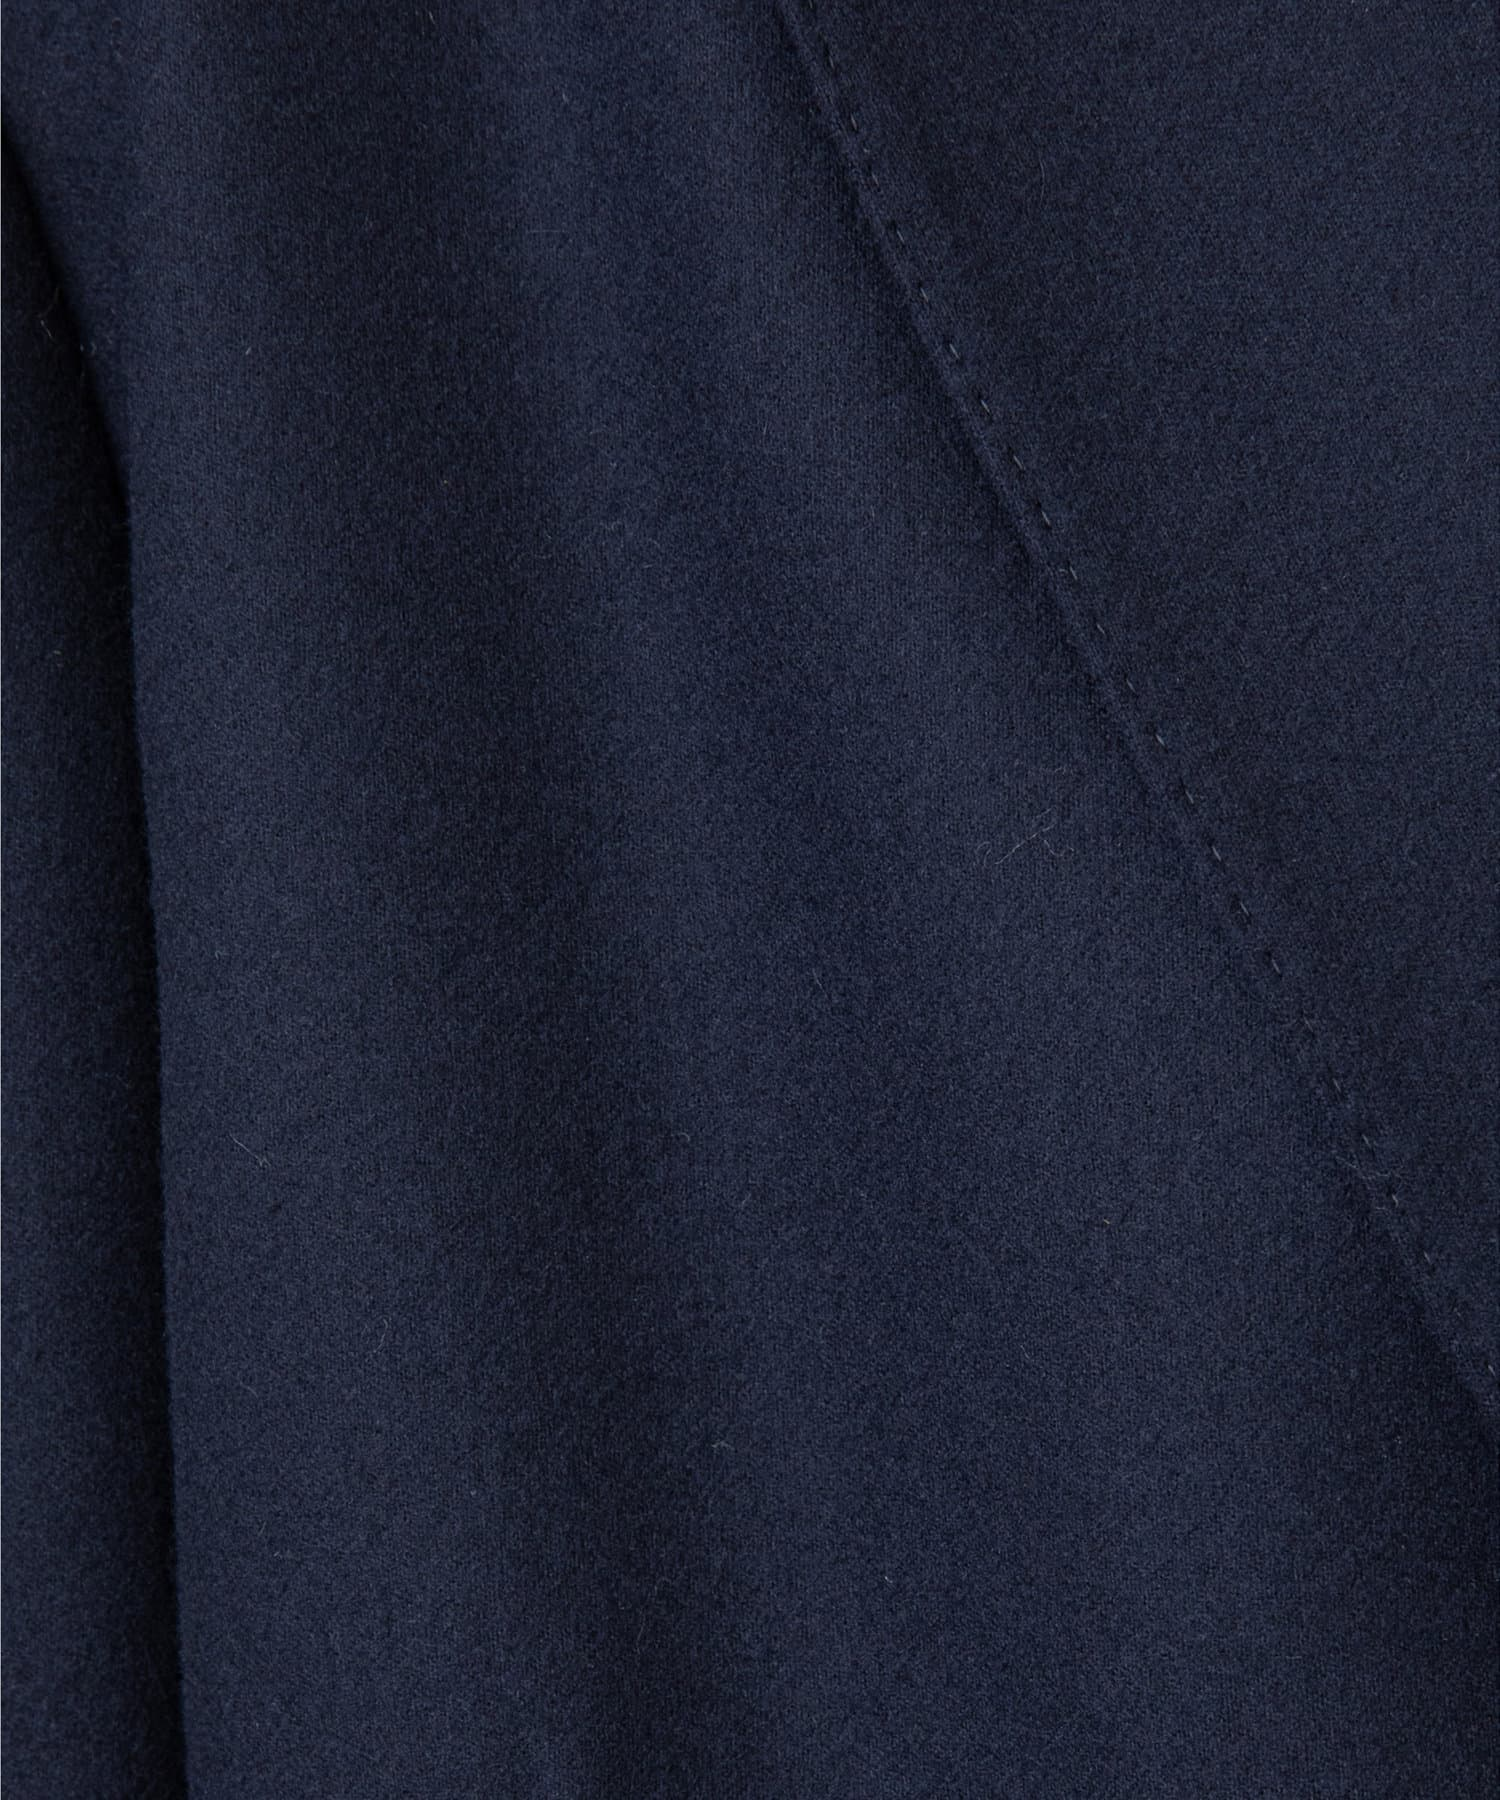 GALLARDAGALANTE(ガリャルダガランテ) 【HERITANOVUM】フラノオーバーサイズジャケット